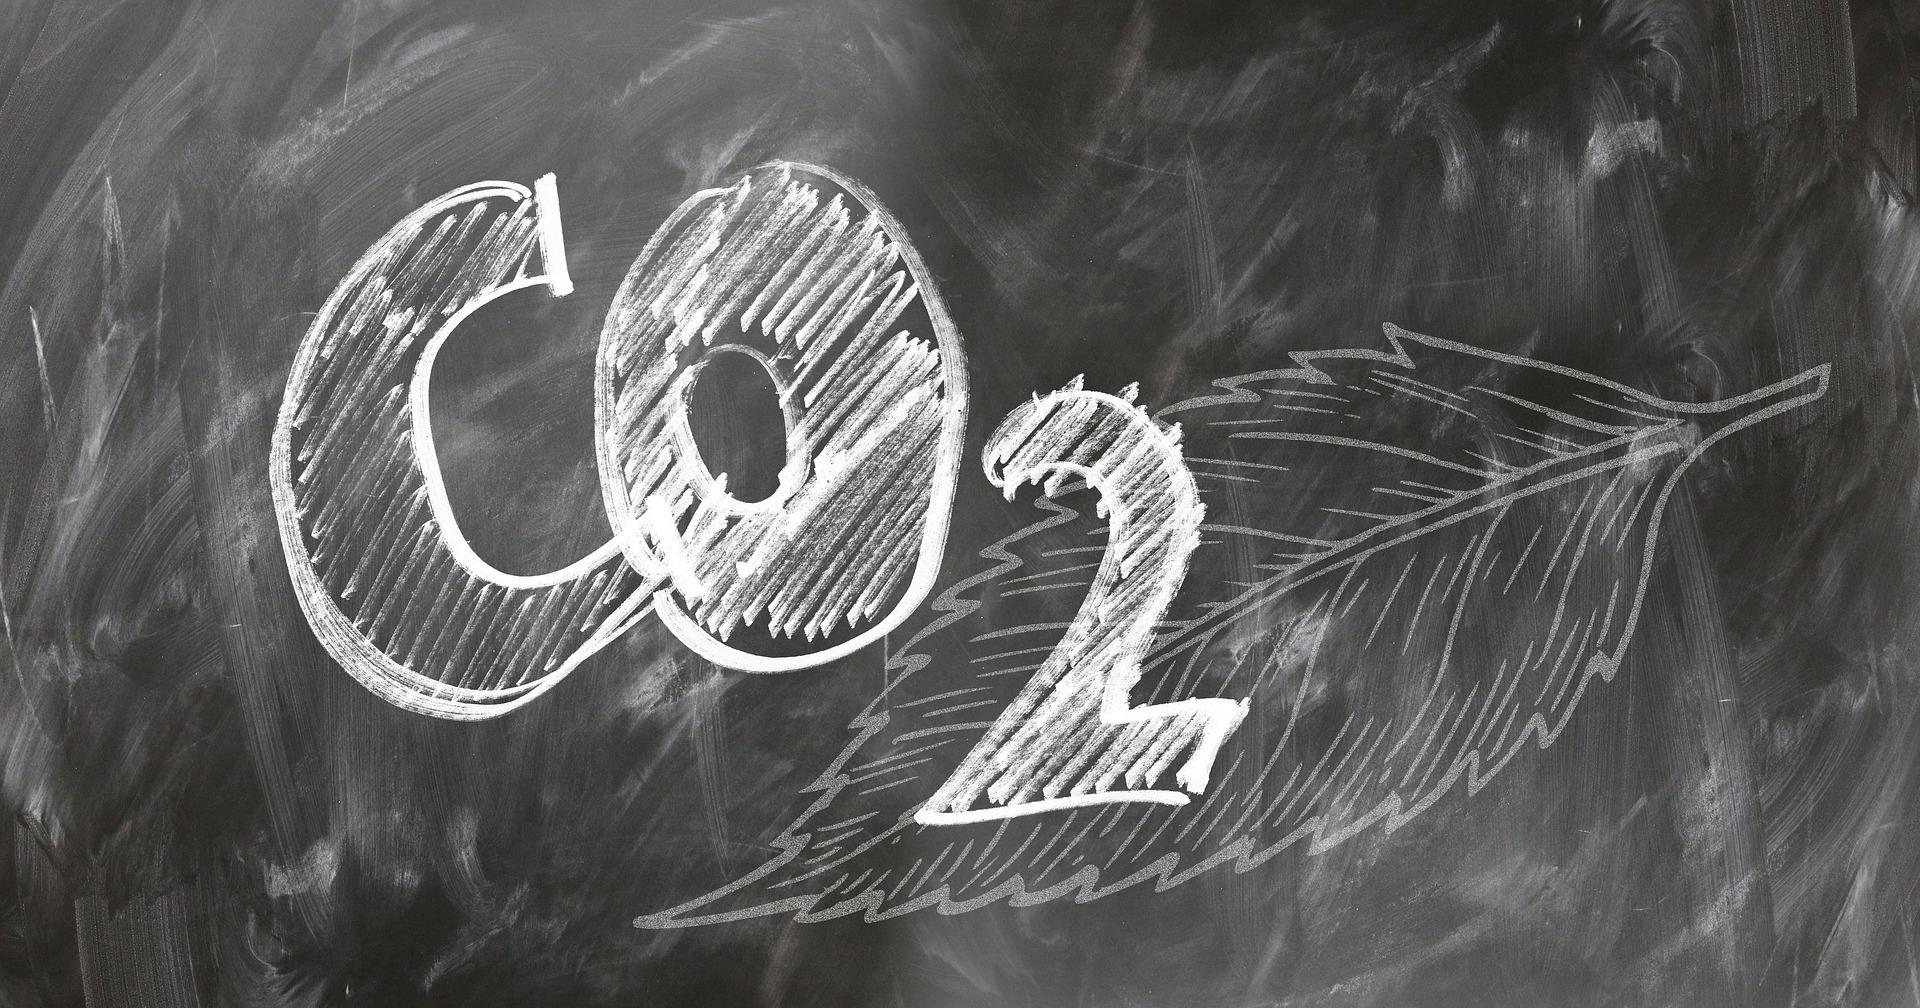 karbonlazpic2.jpg